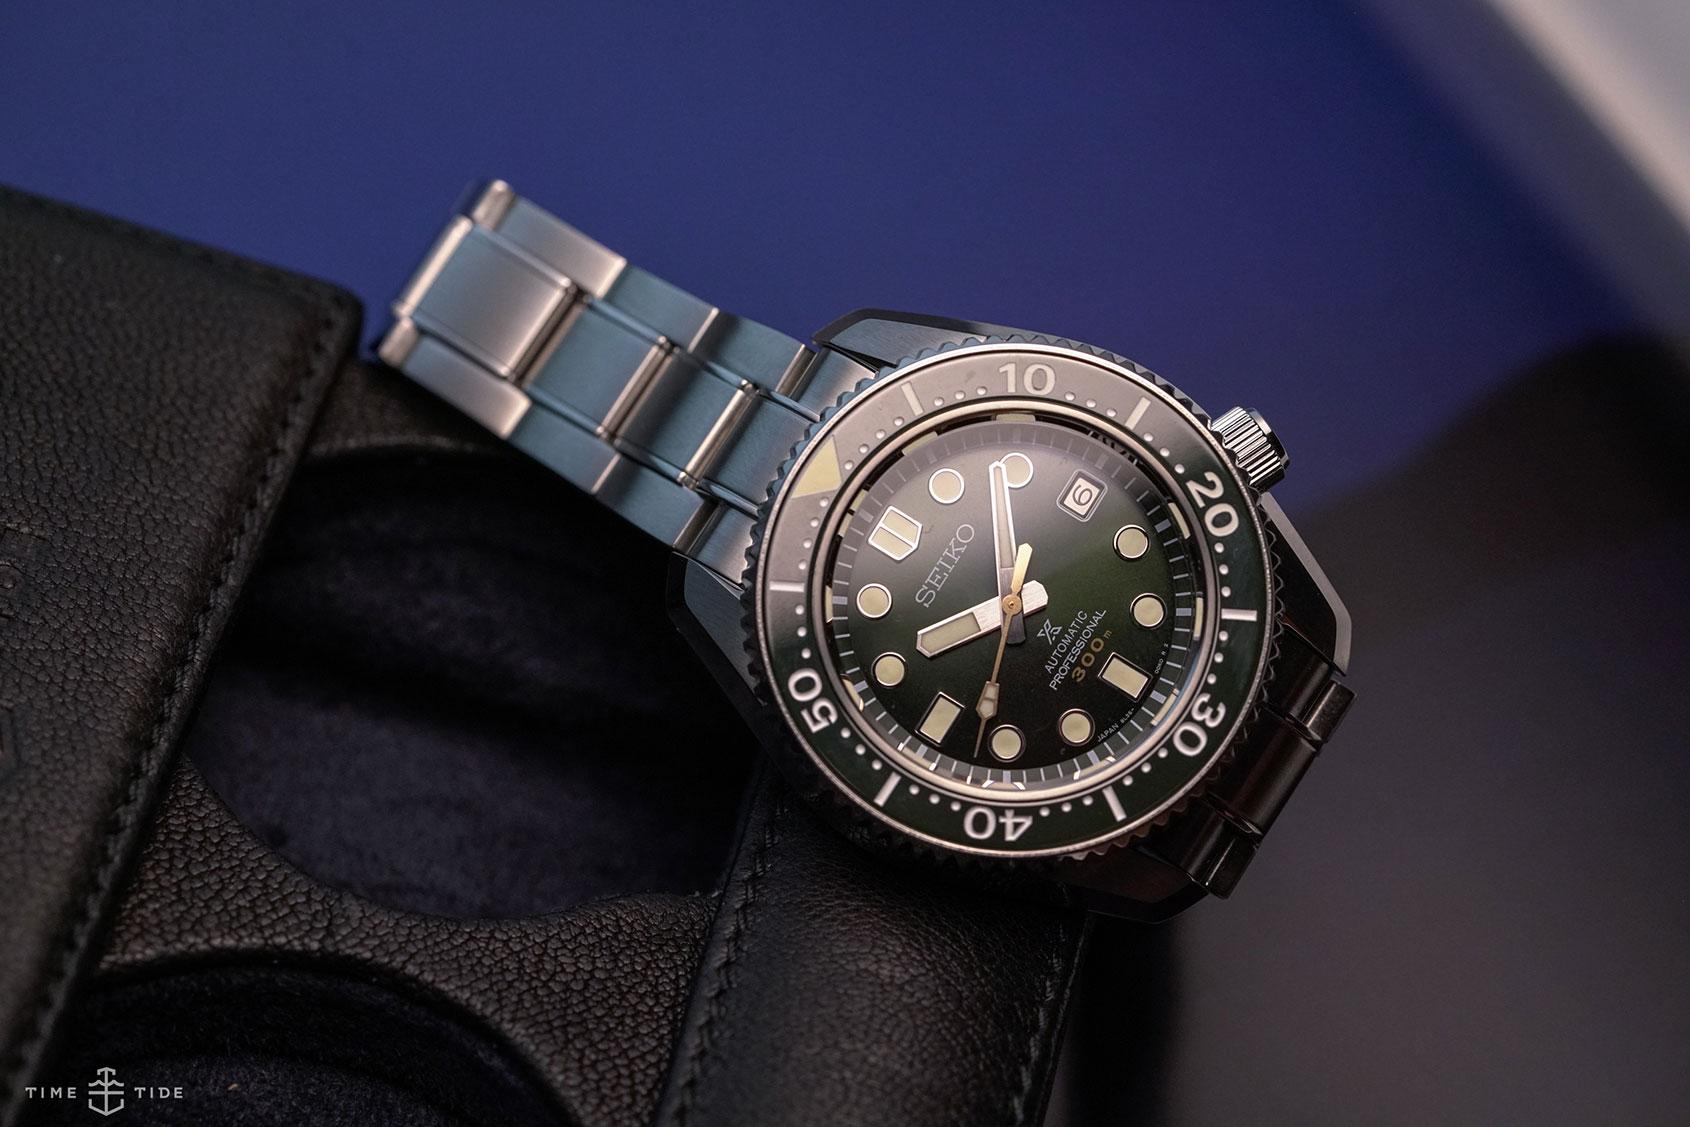 HANDS-ON: The Seiko 1968 Automatic Diver's Commemorative Limited Edition (ref. SLA019)